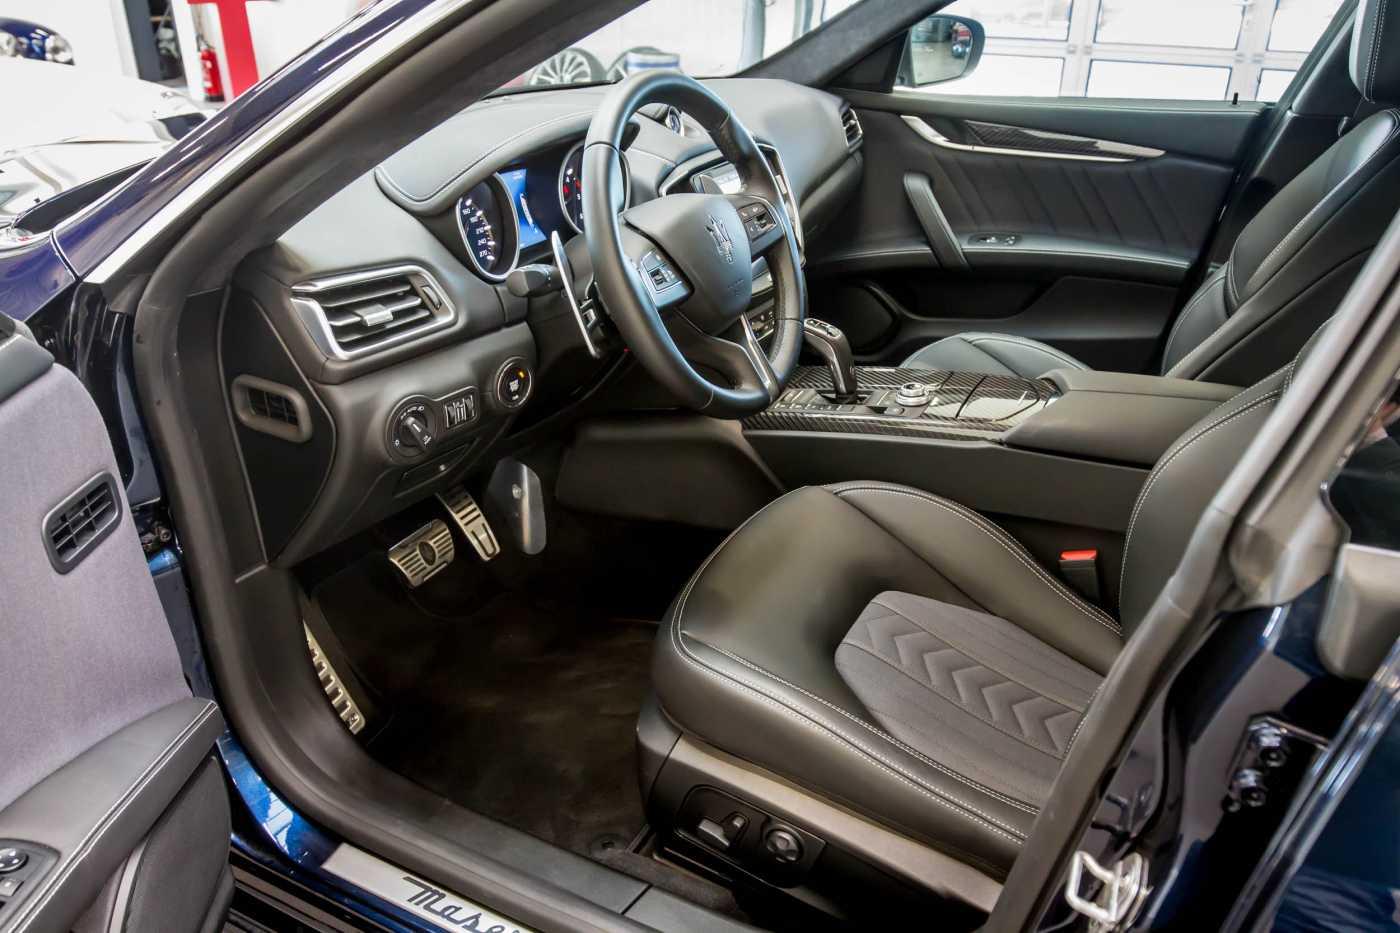 Maserati Ghibli Diesel GranLusso Keyless Sports Exhaust LED Camera 7/29